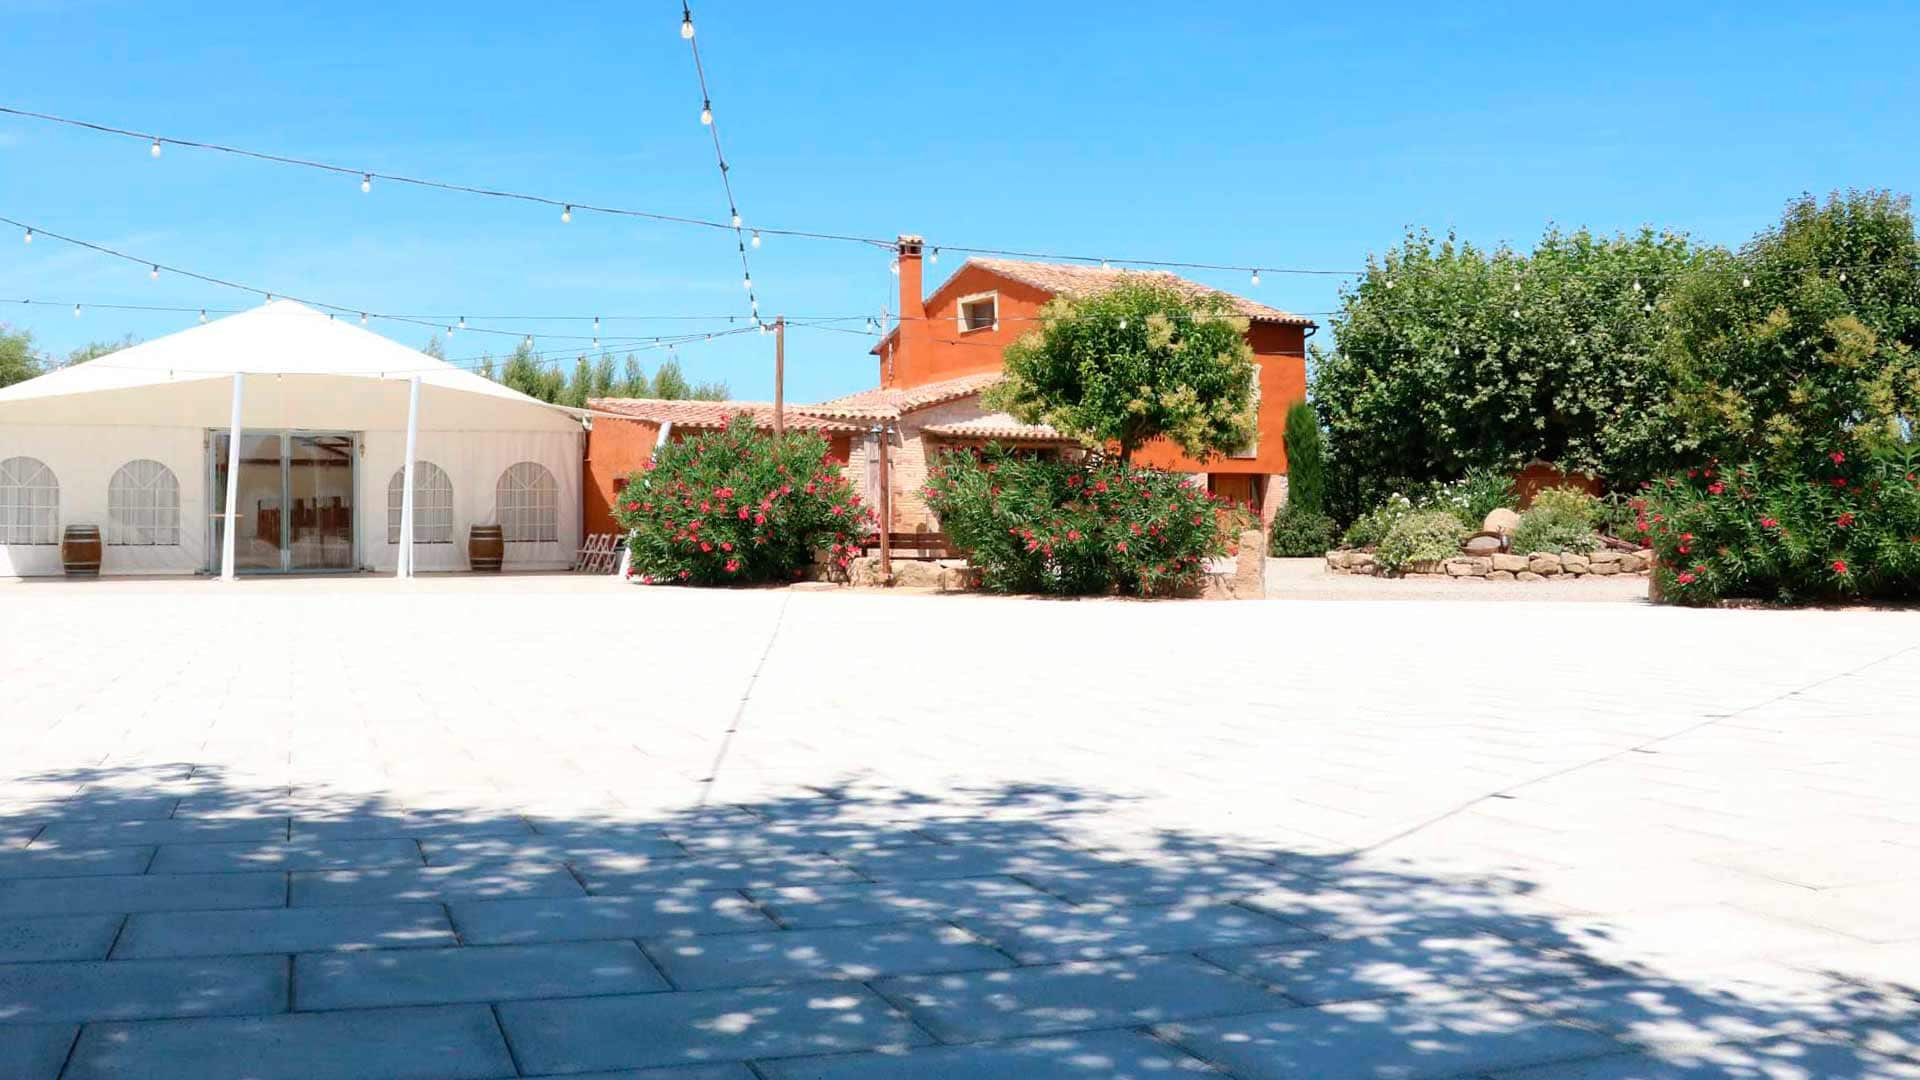 pujol-paviments-terratzo-exterior-masia-2